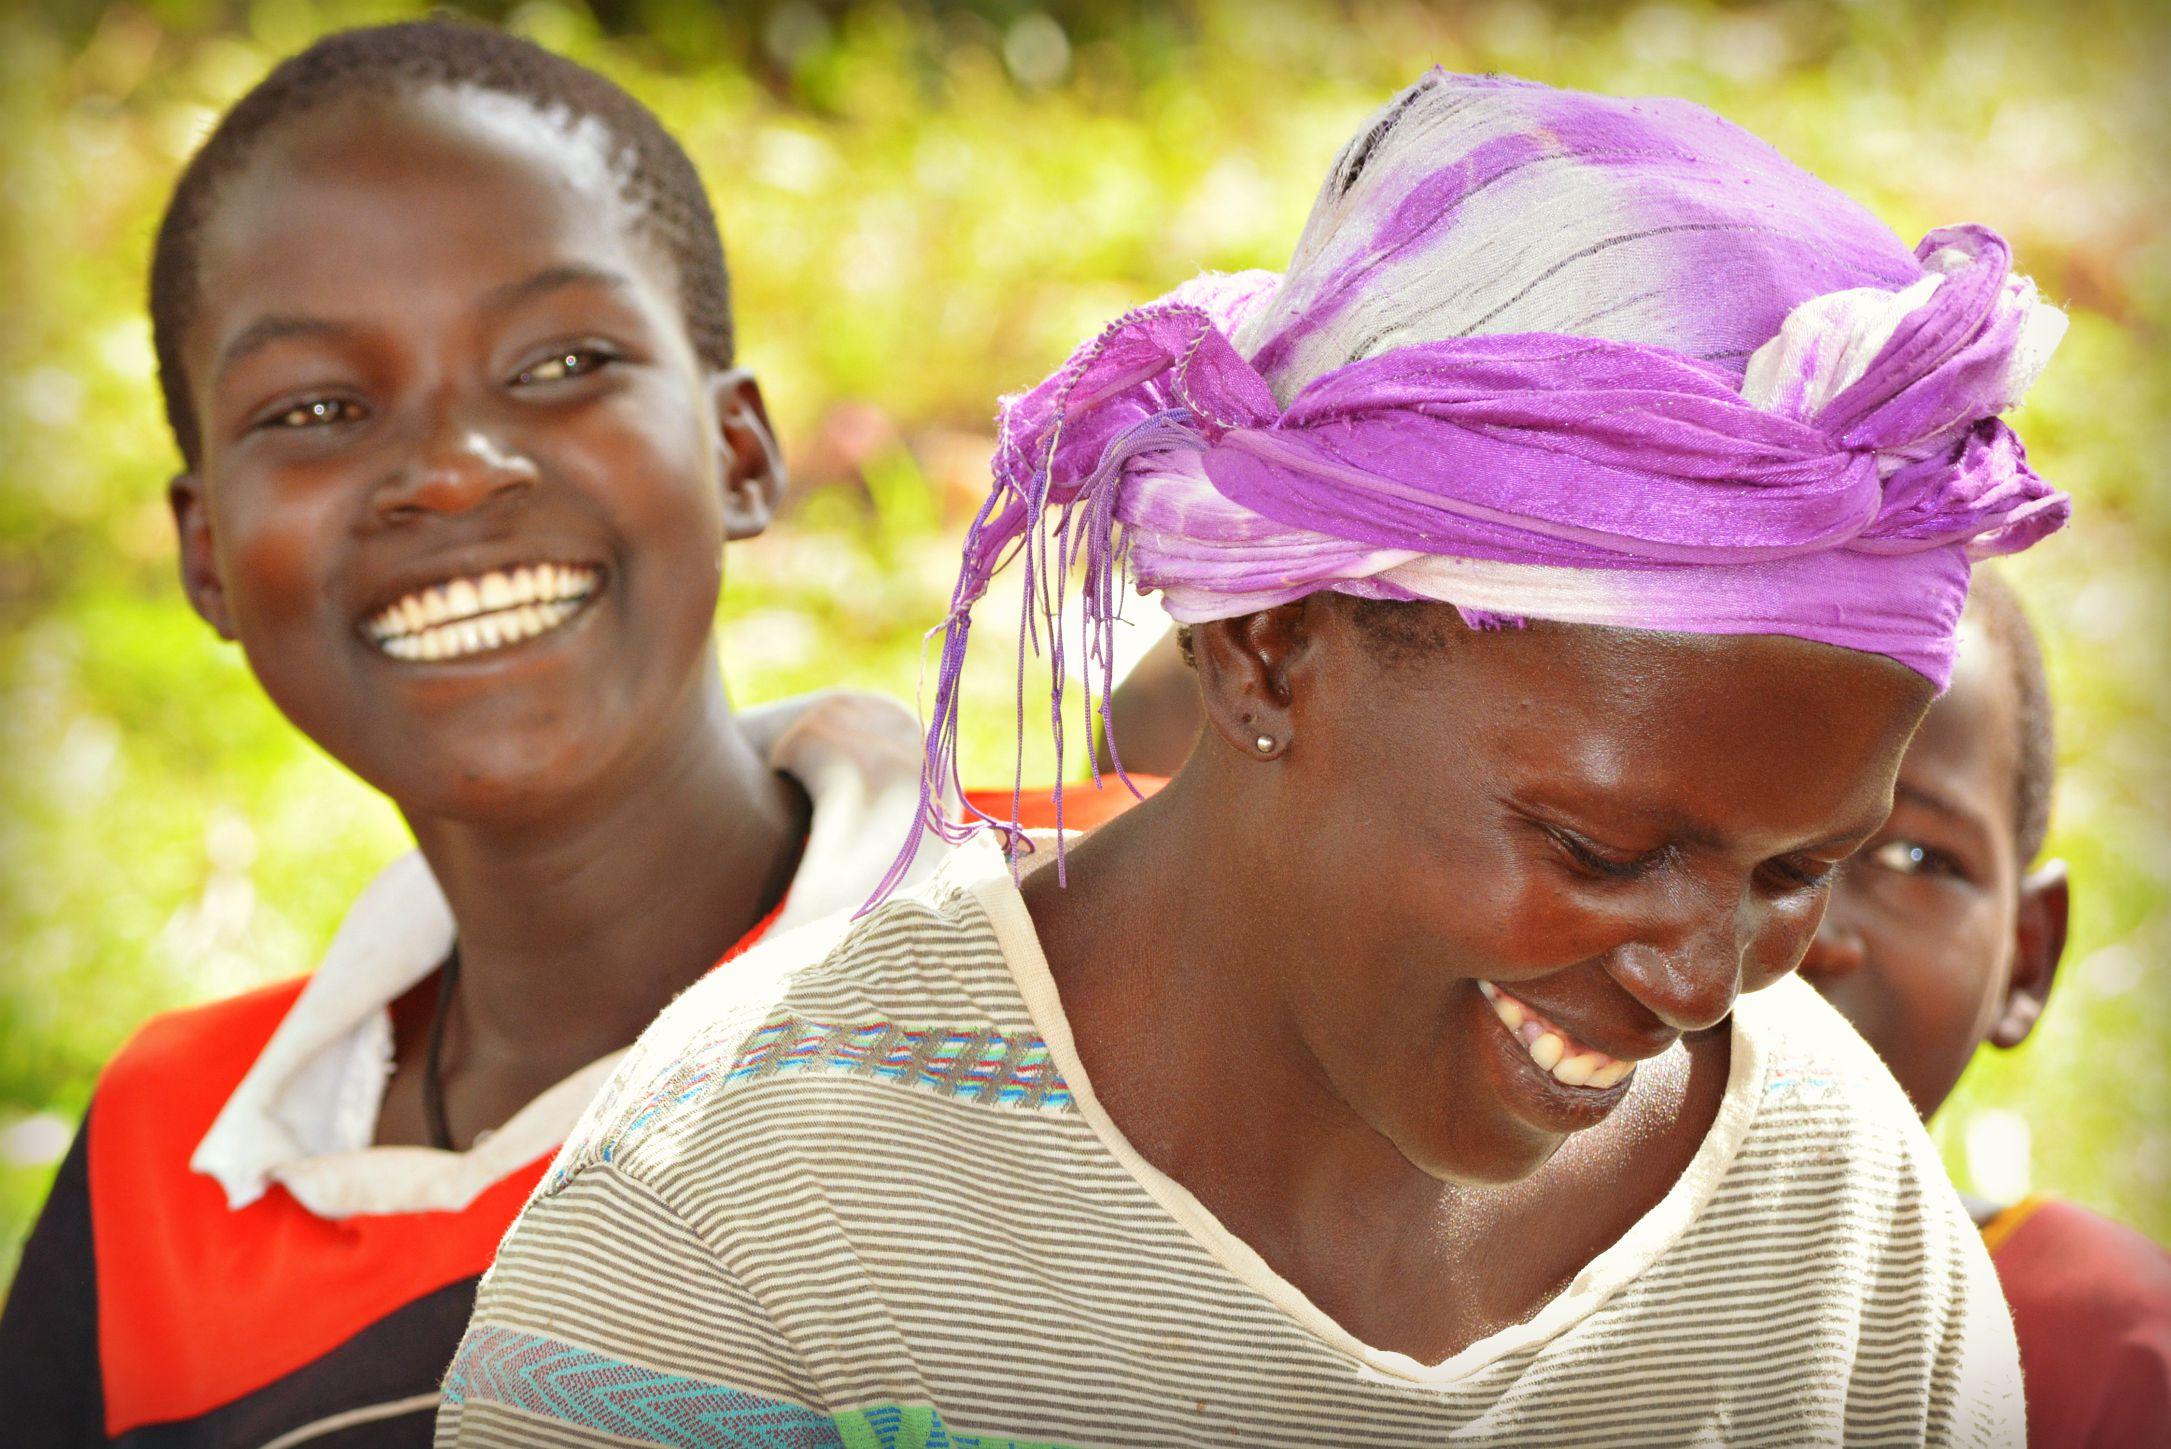 woman purple scarf smiling.jpg